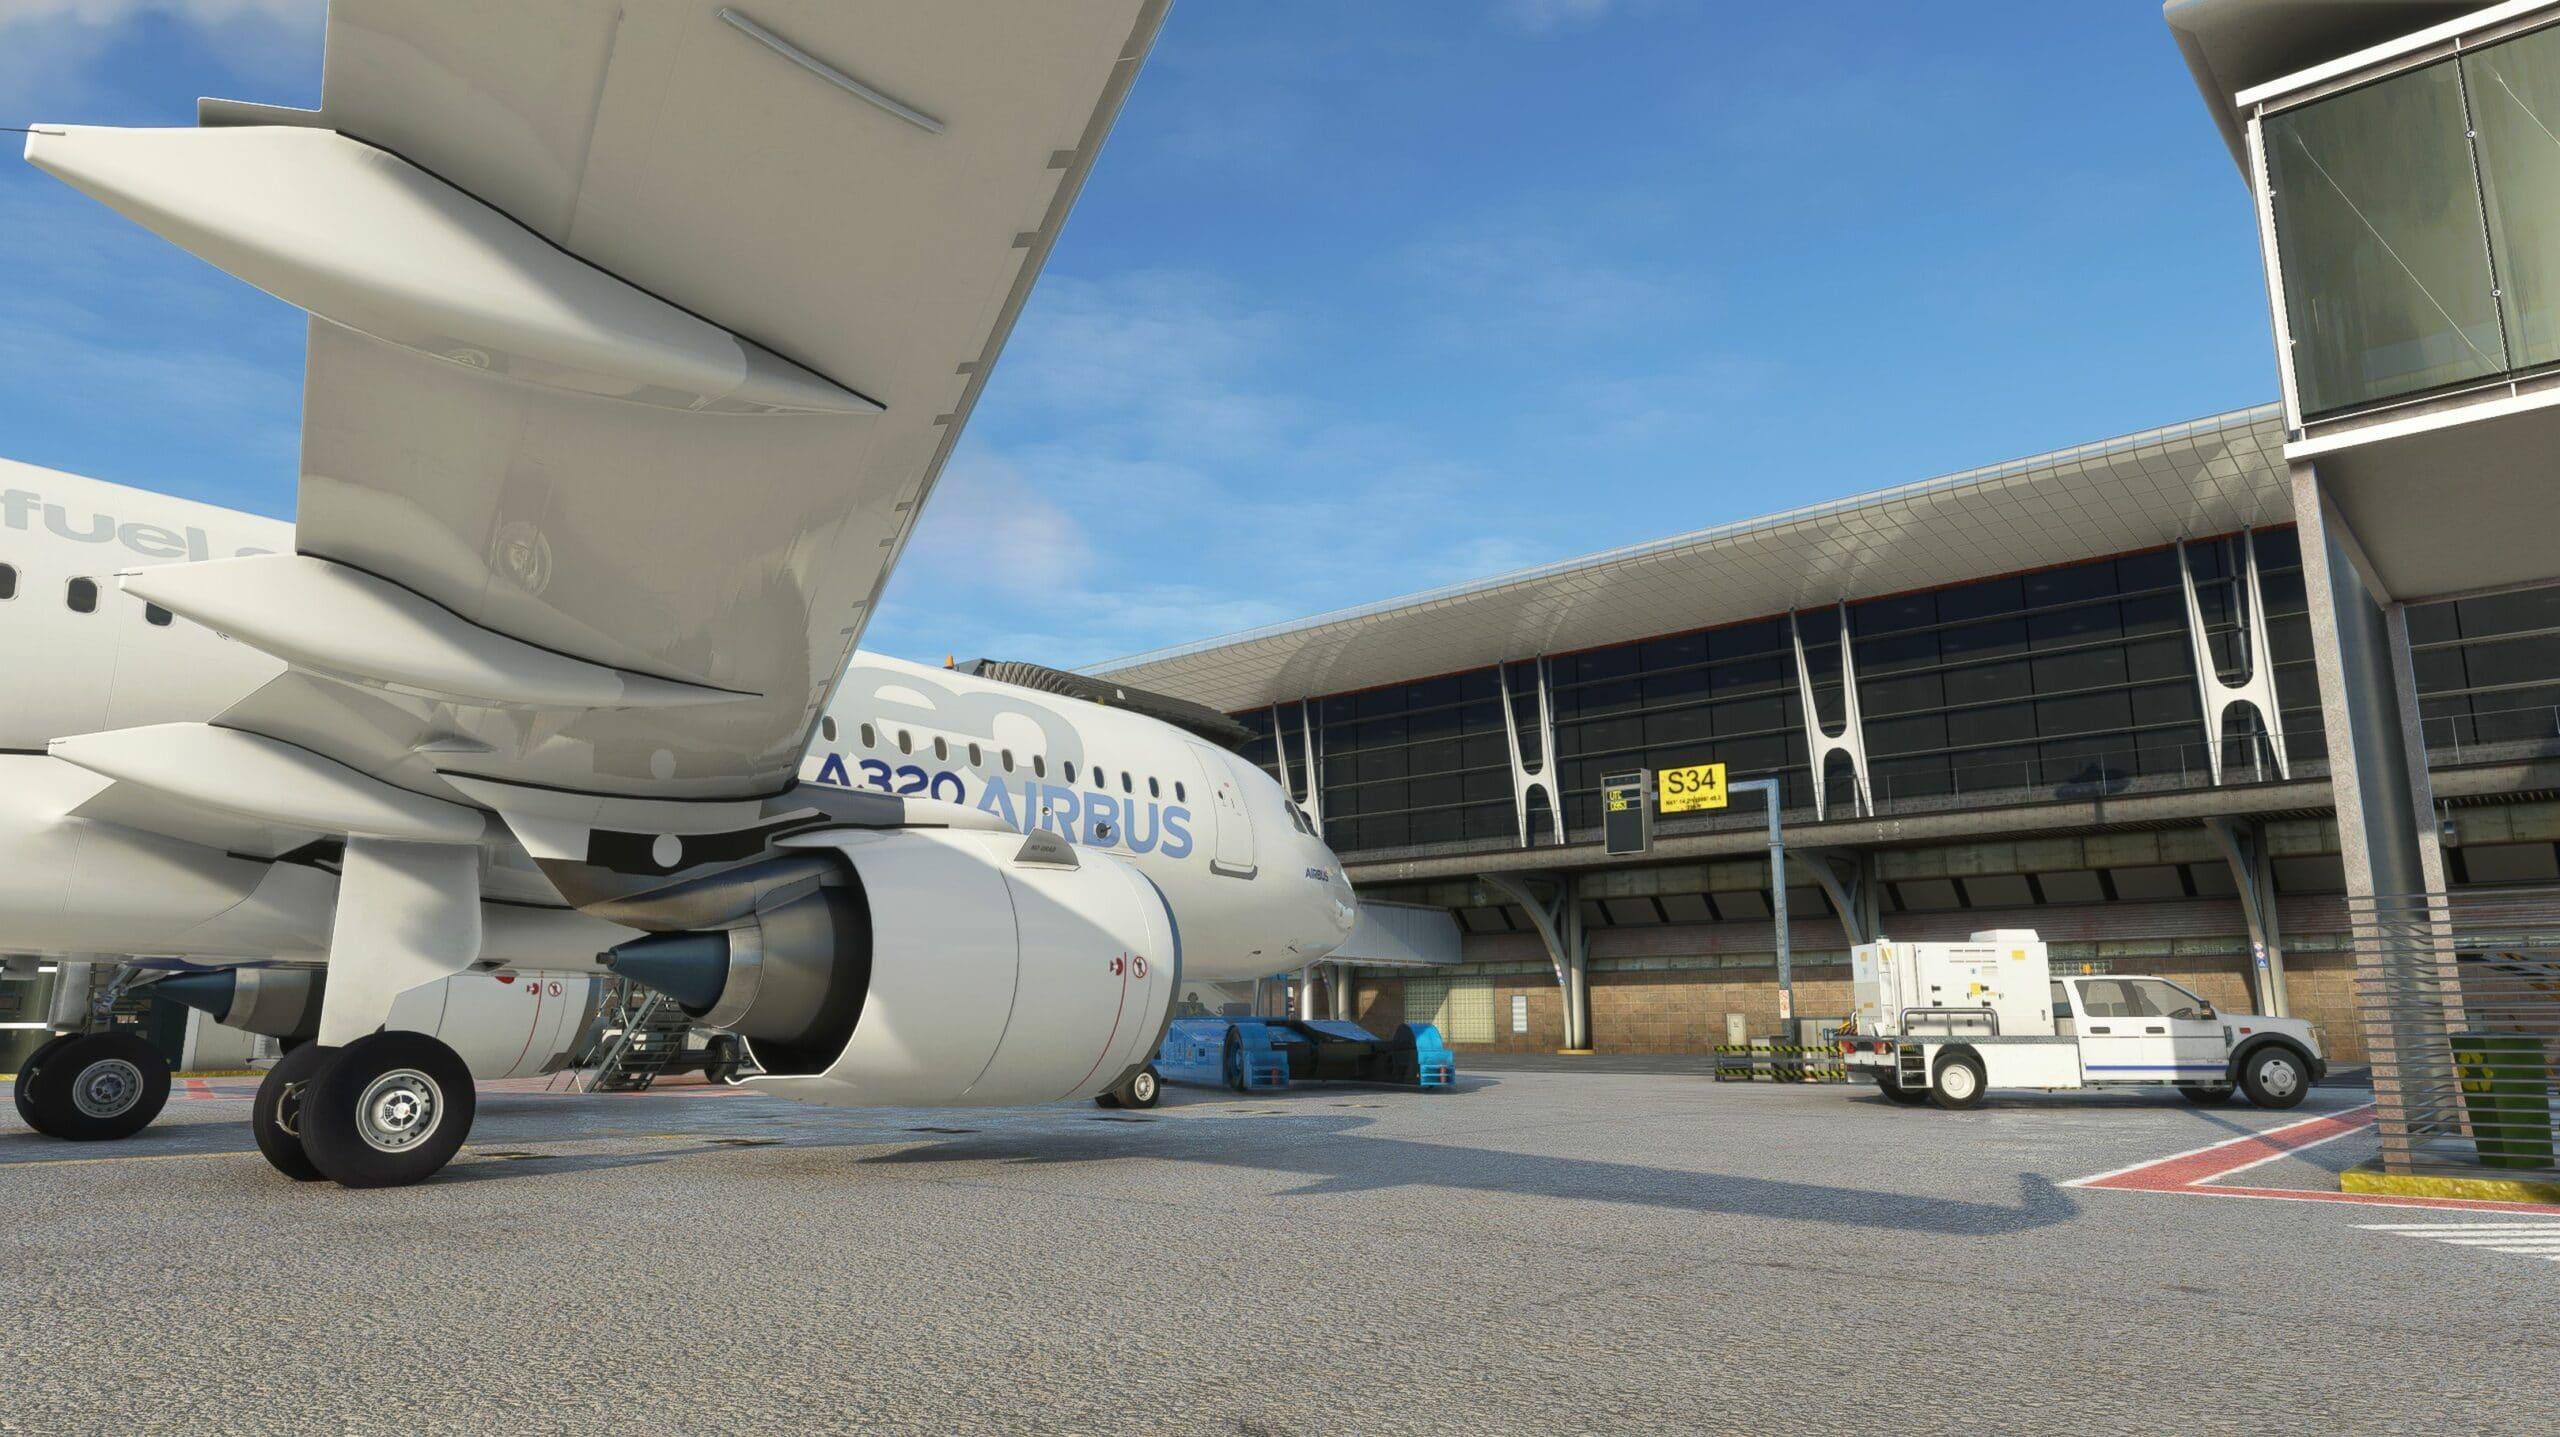 277137_Microsoft_Flight_Simulator_21_10_05_12_52_00_PM